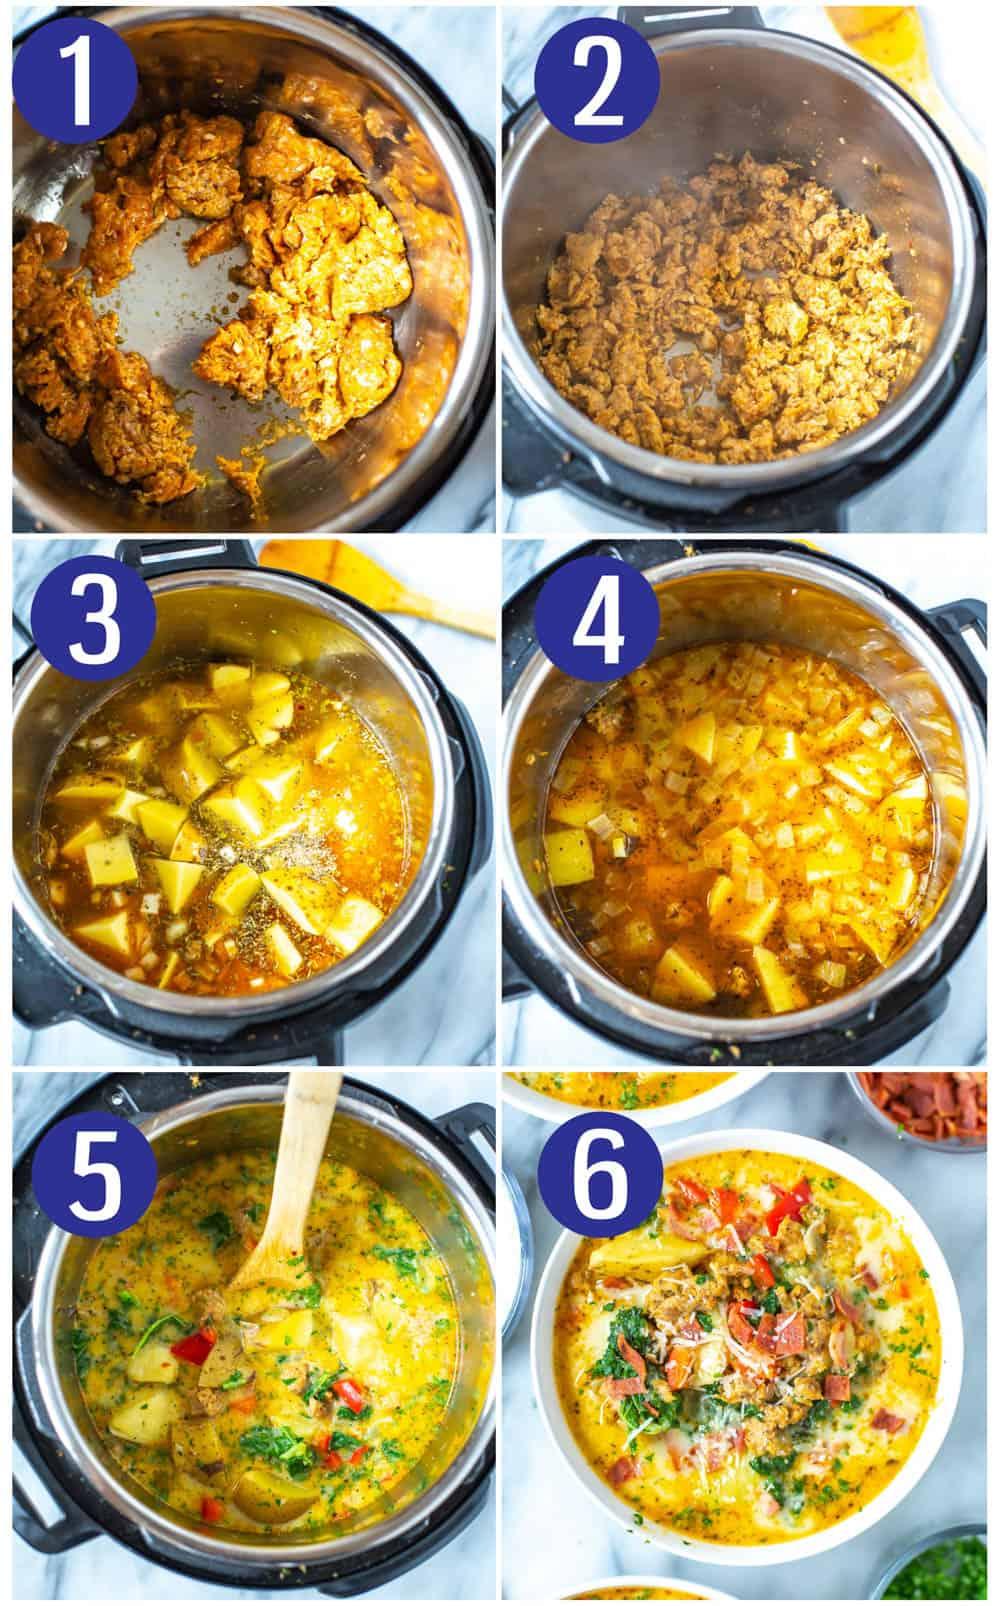 Instant Pot Zuppa Toscana Soup